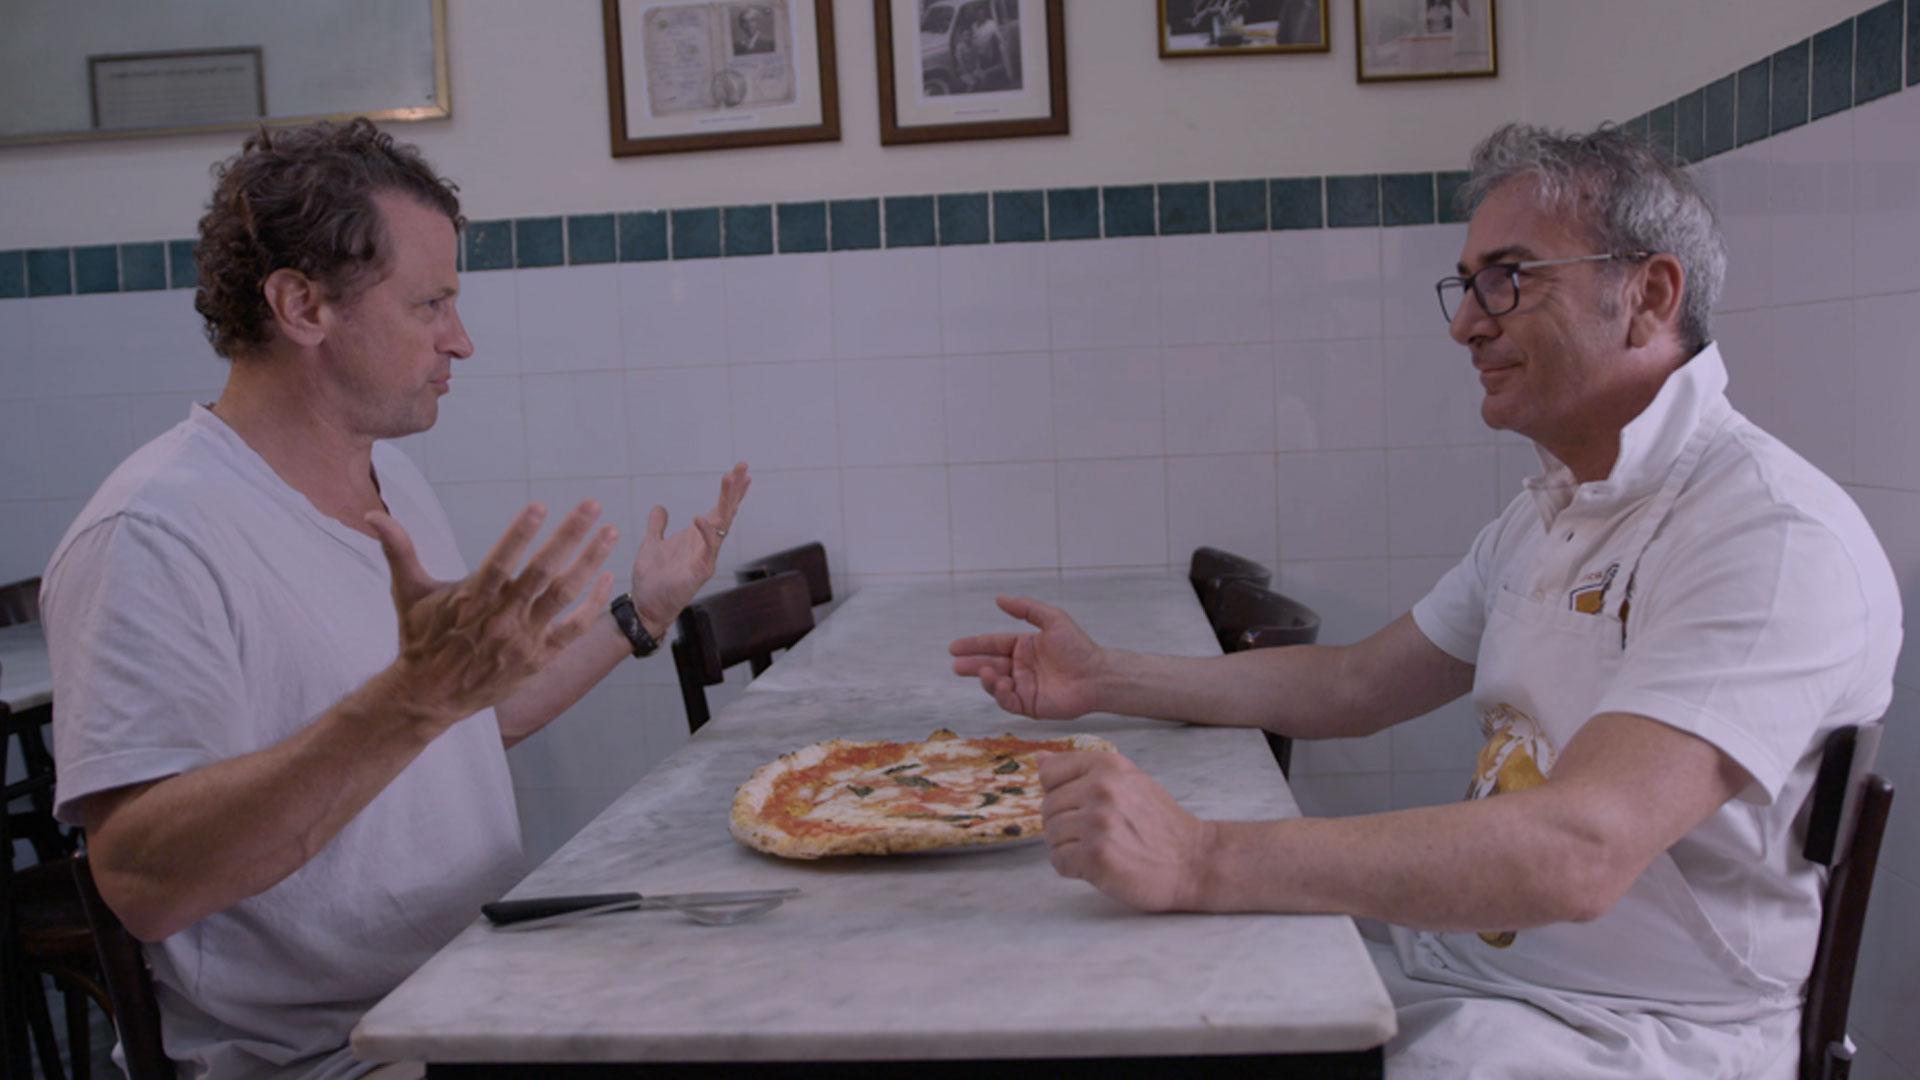 Naples Took a Pizza My Heart